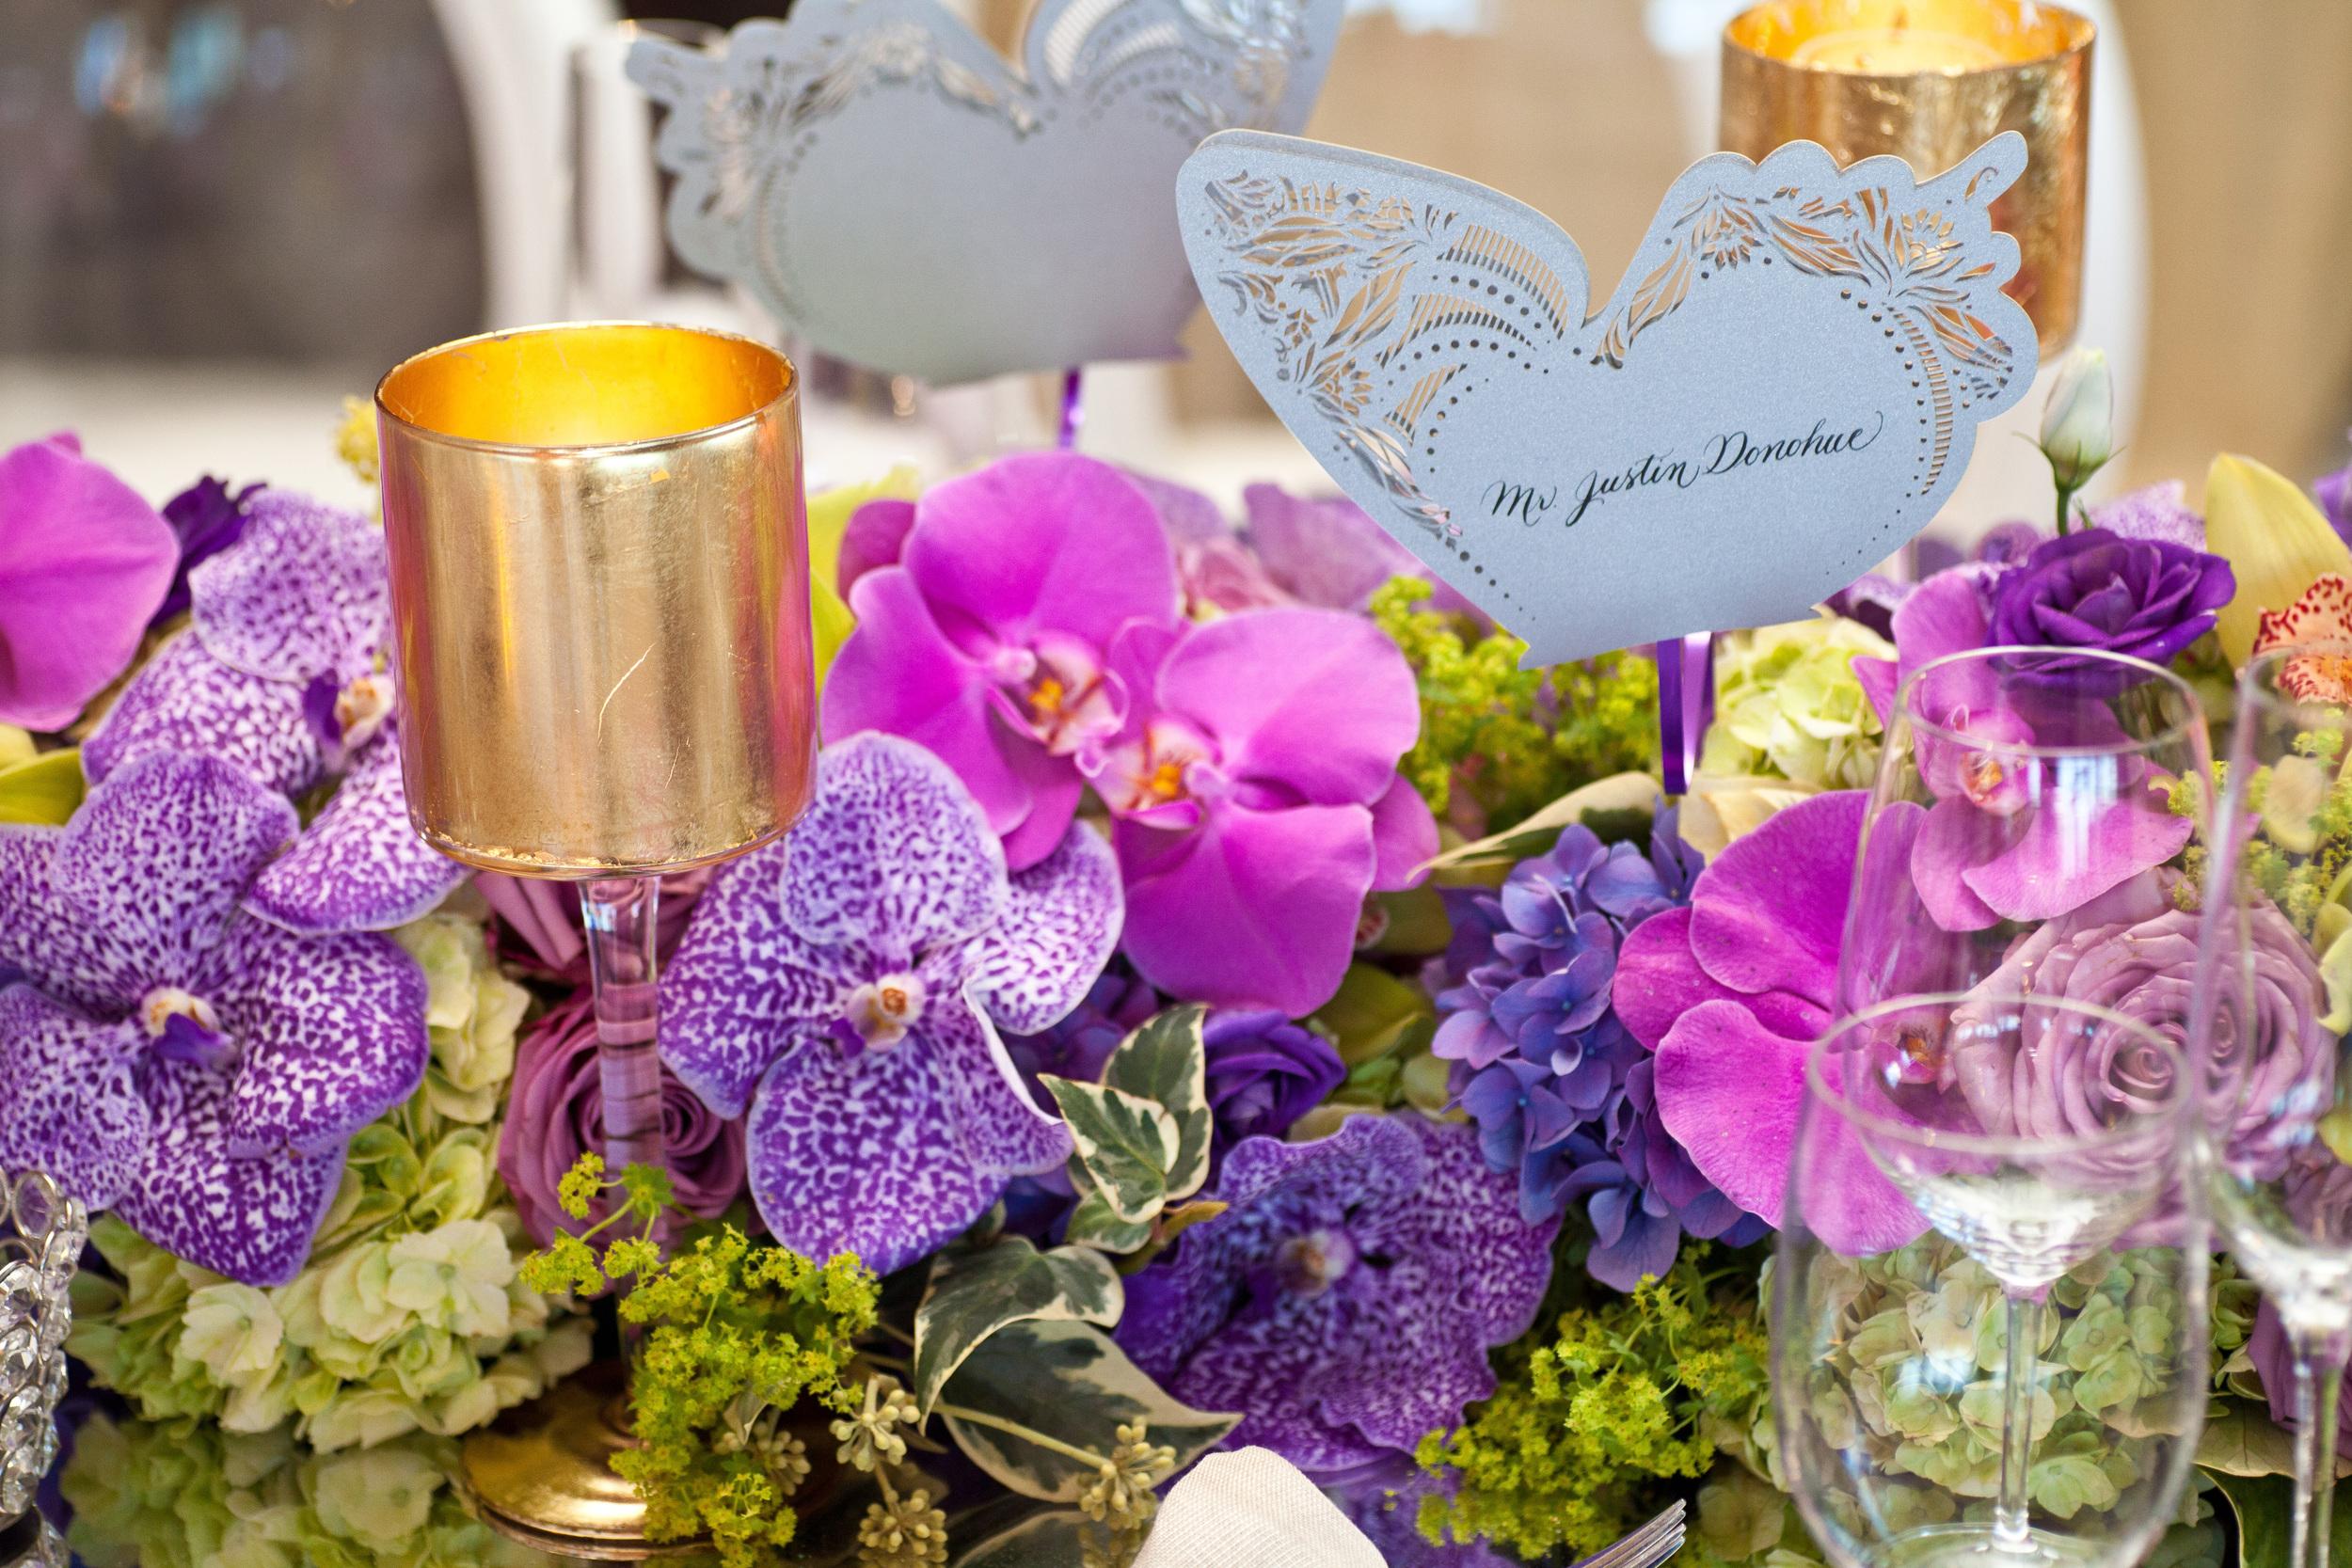 mandarin_oriental_new_york_city_branding_inspiration_lavender_silver_wedding_floral_purple_v284_32.jpg